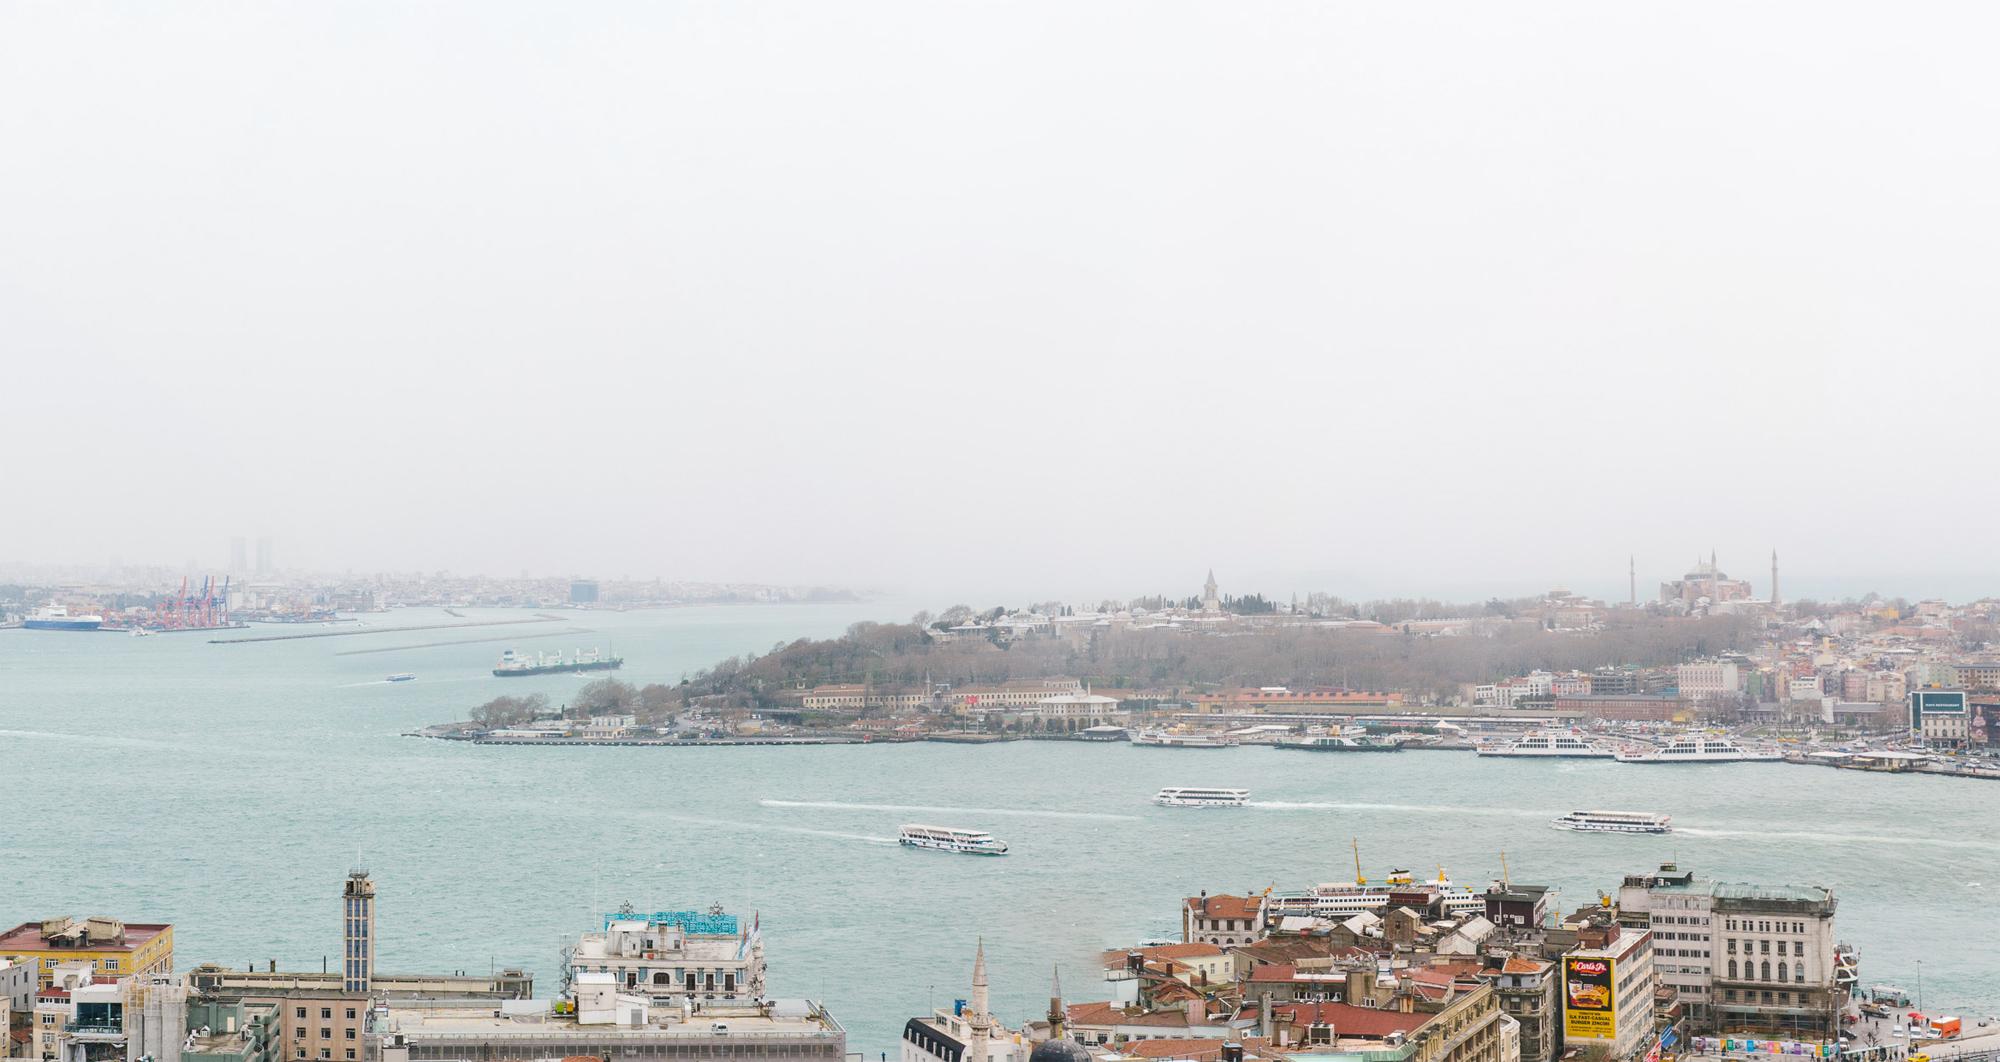 Istanbul_Bosphorus-AudiMagazine-FinnBeales-01.jpg